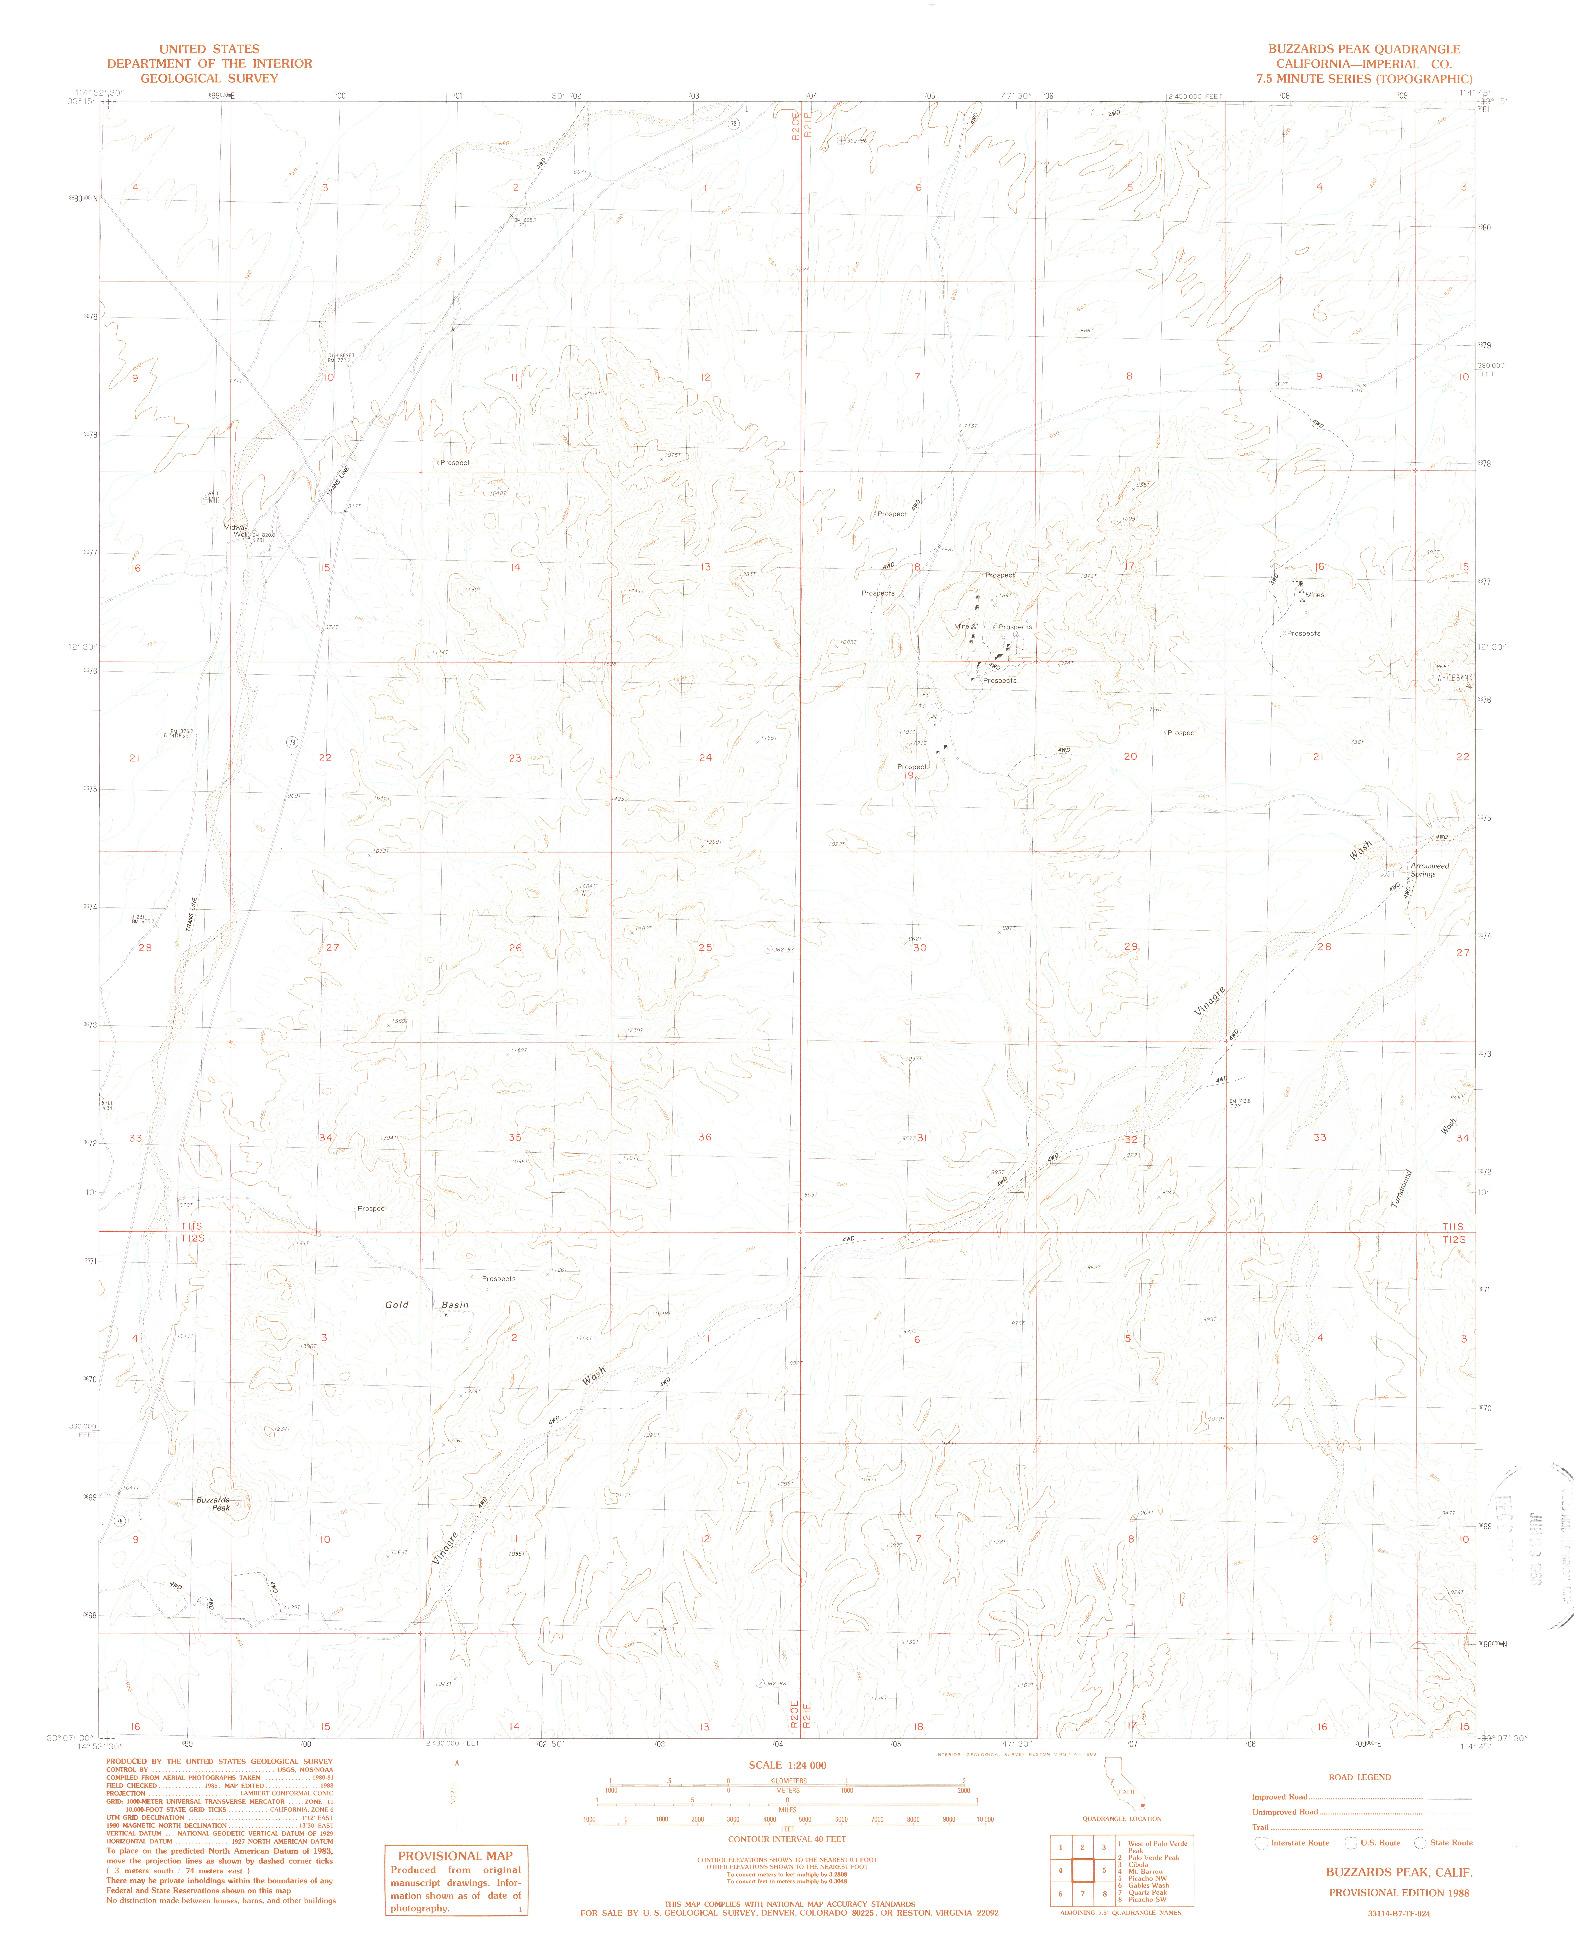 USGS 1:24000-SCALE QUADRANGLE FOR BUZZARDS PEAK, CA 1988